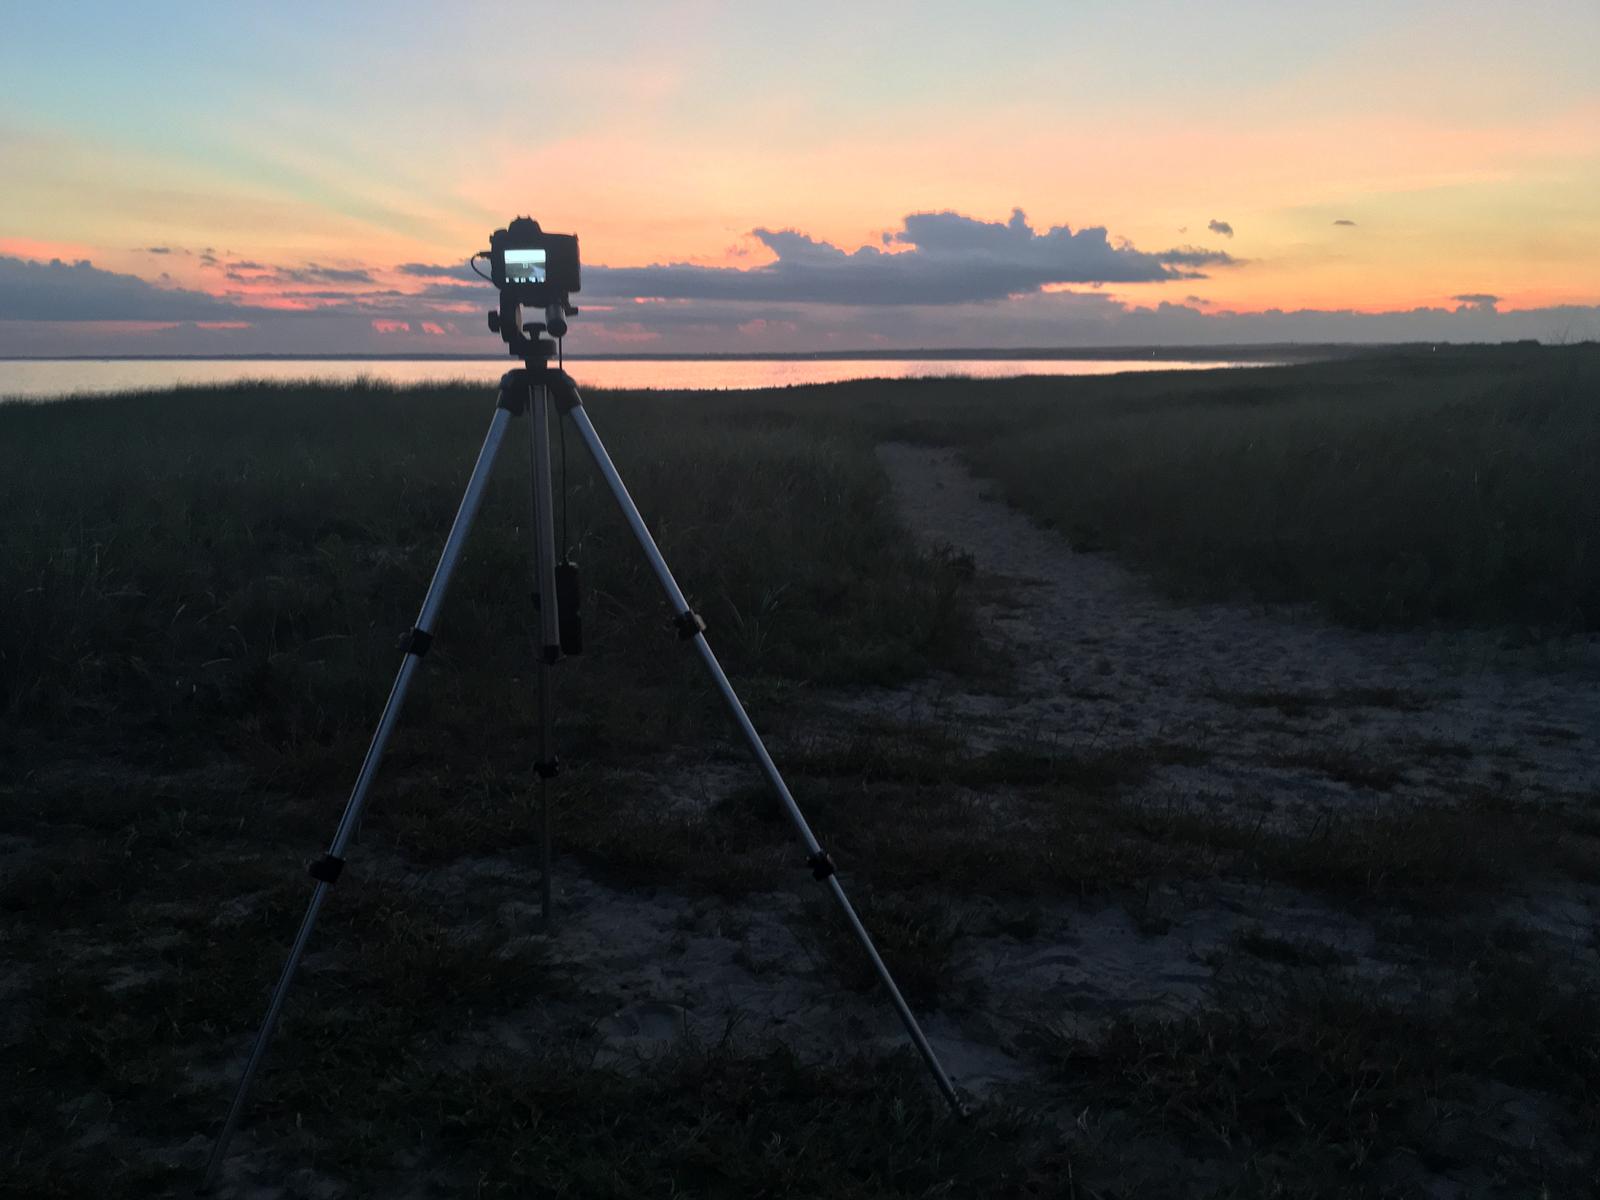 Camera set up to shoot sunset Time lapse